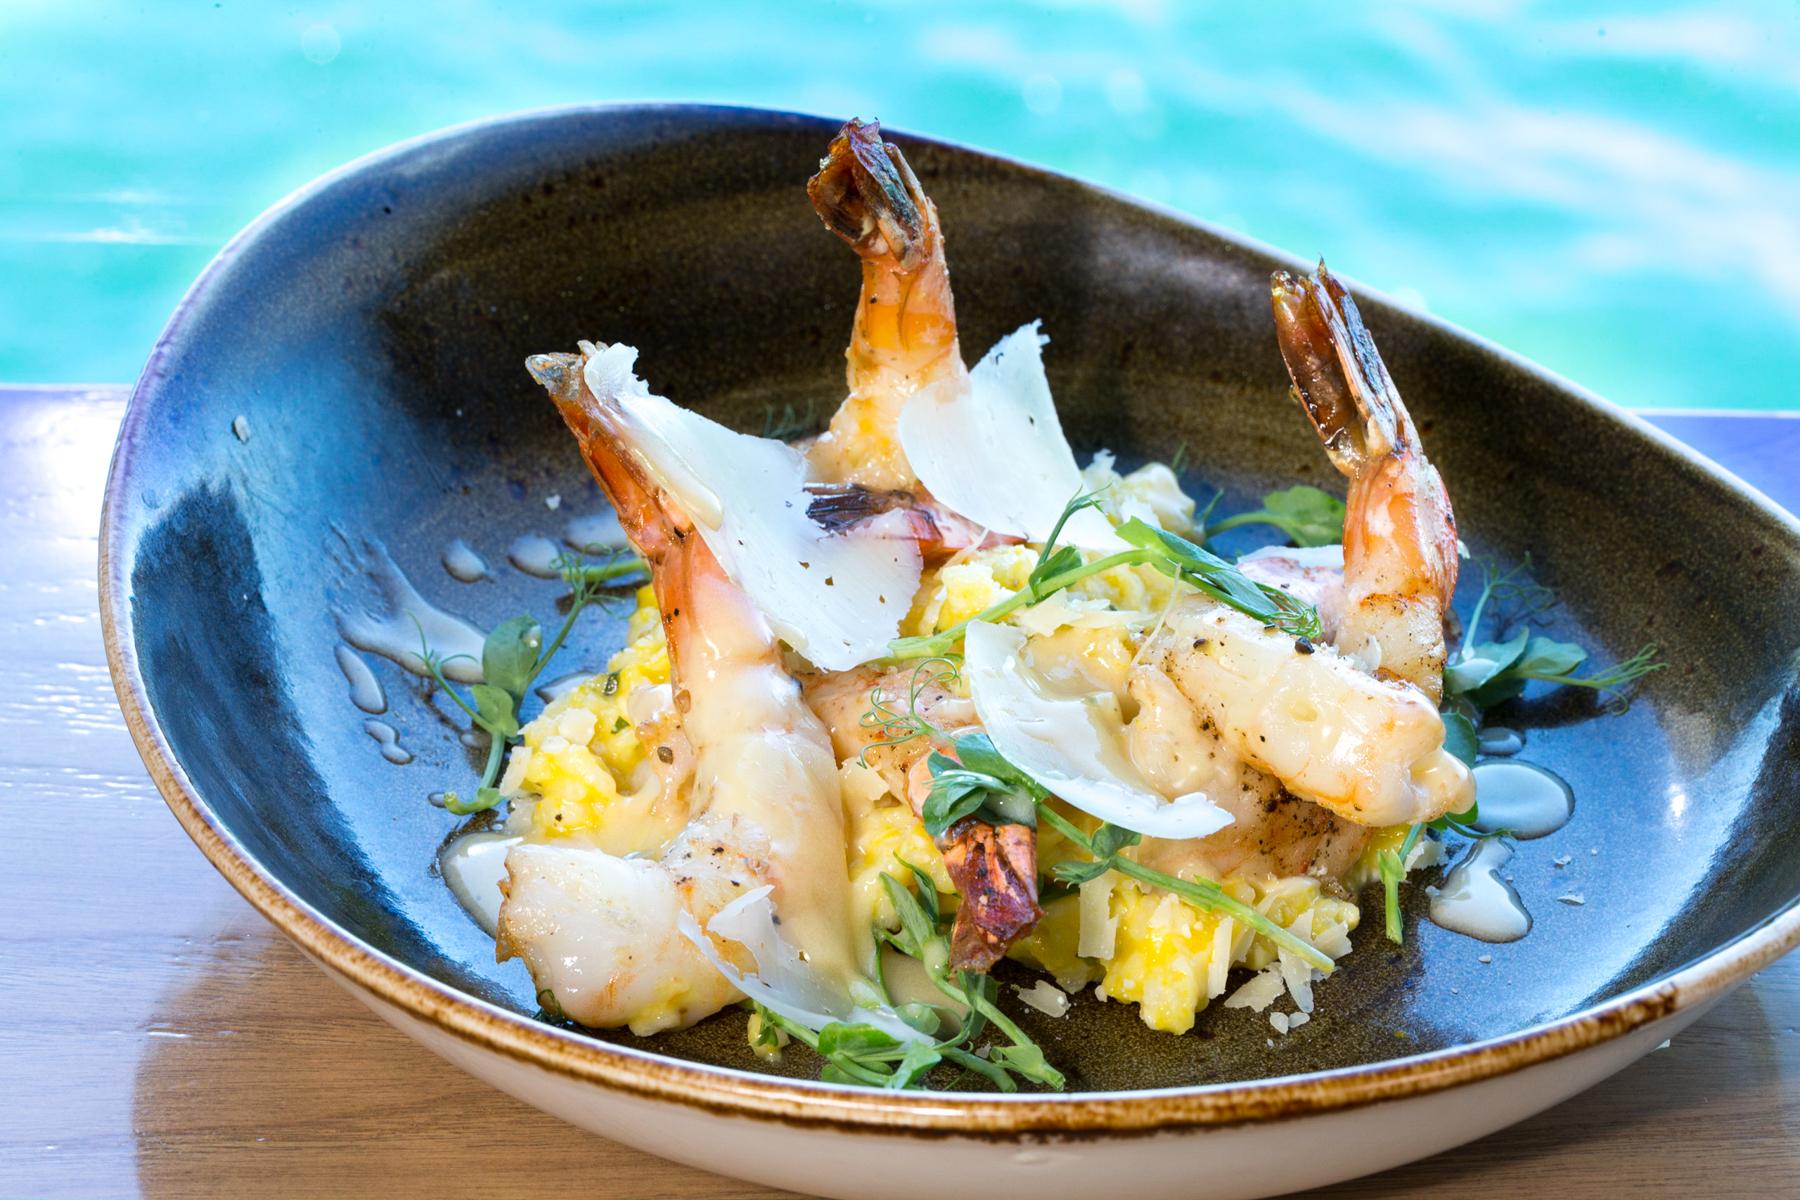 Roy's Hawaii_Lemon & Black Peppercorn Crusted Shrimp | Roasted Barley & Kabocha Risotto__pc Craig Bixel_10-2017.jpg